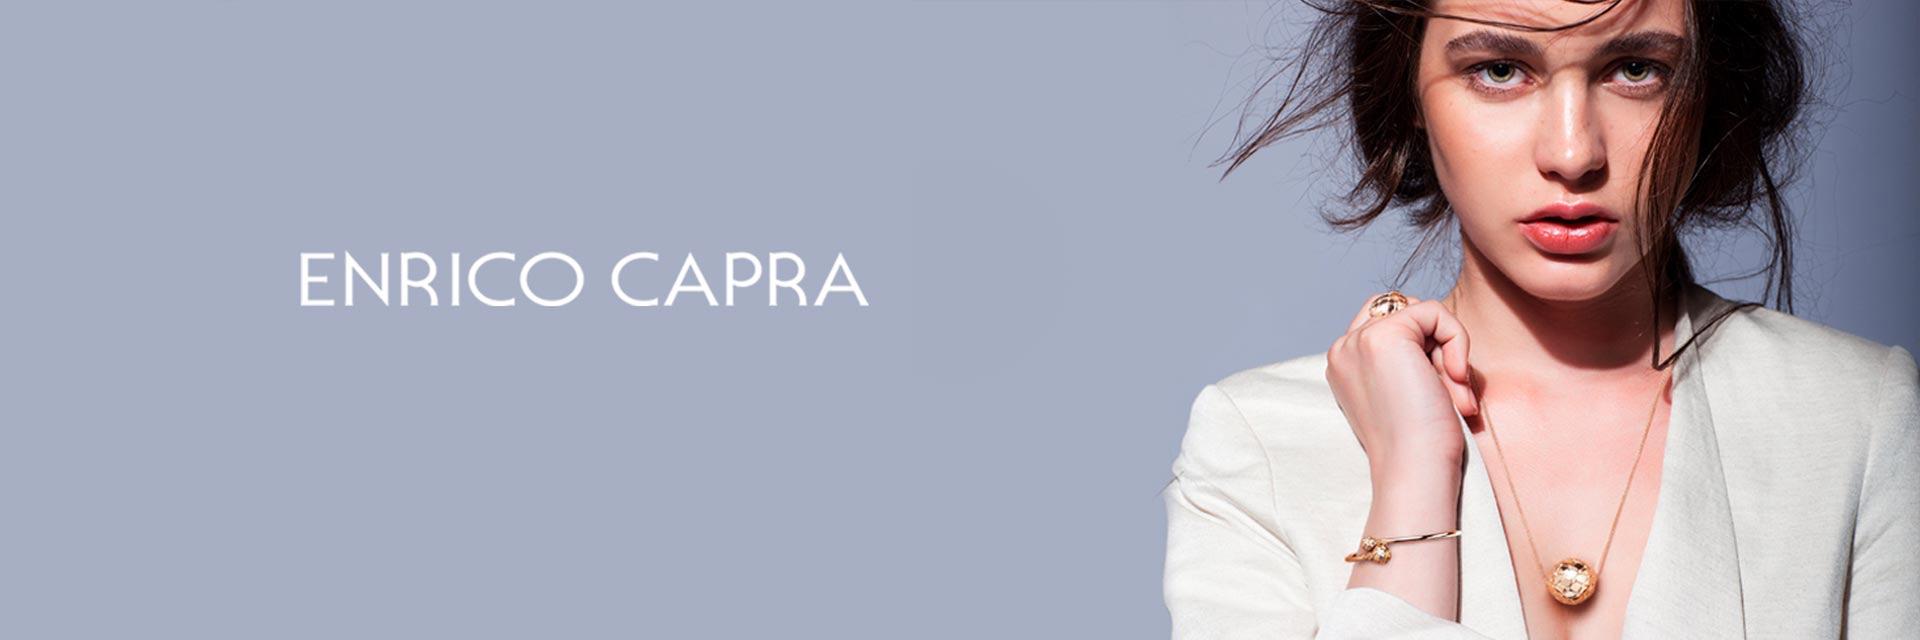 biżuteria Enrico Capra